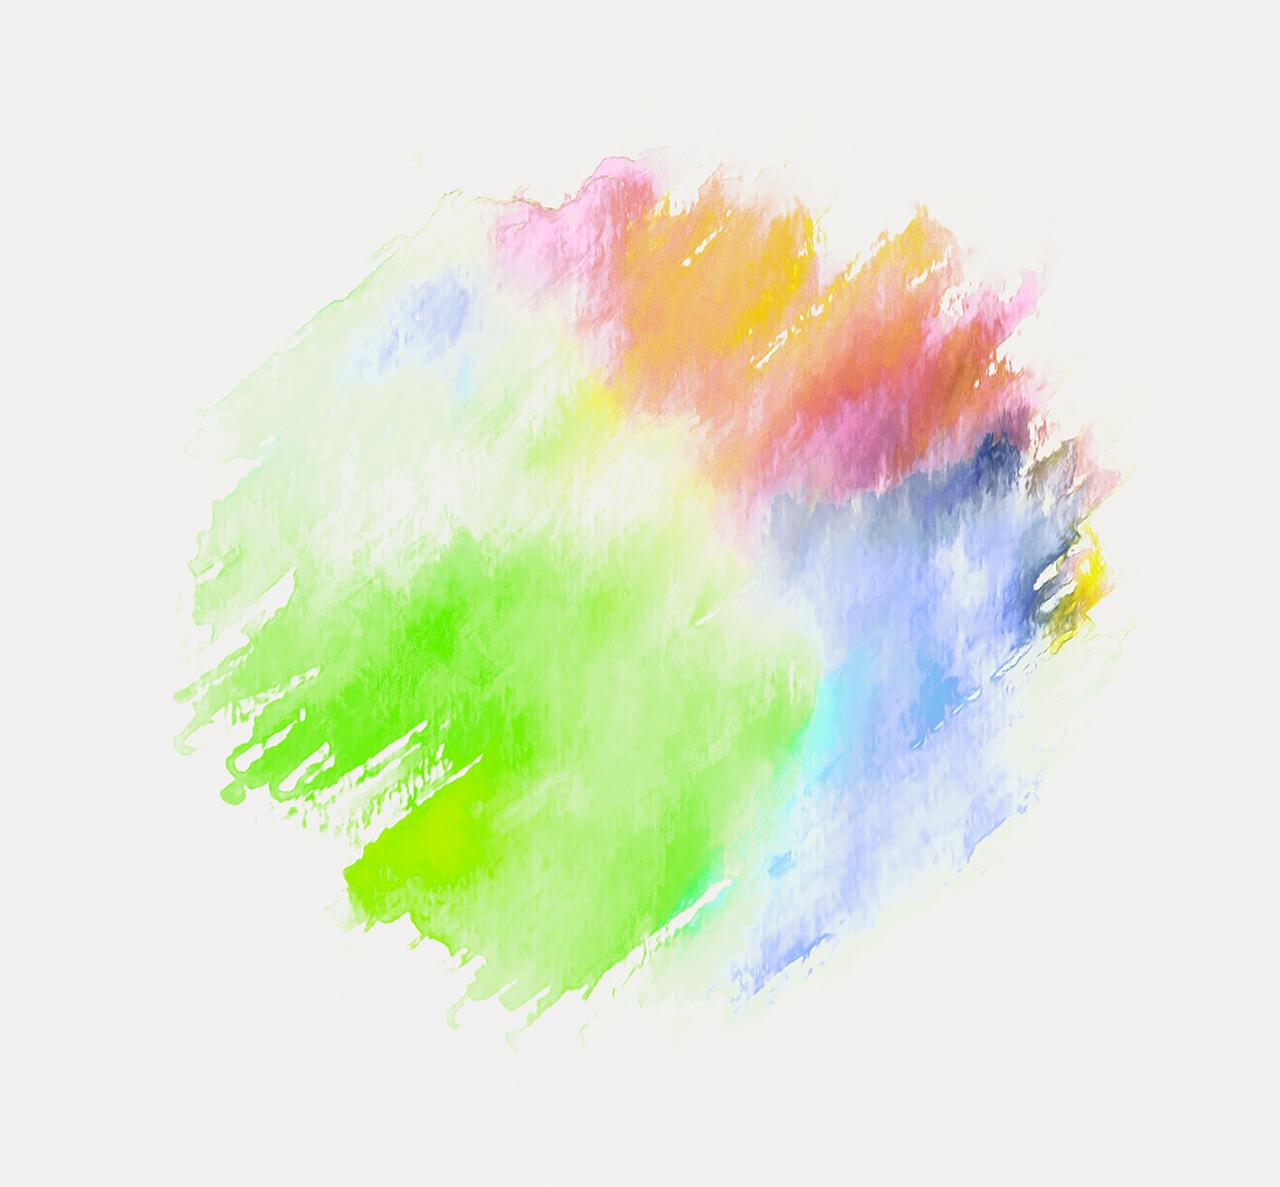 Watercolor Splash   Free image on Pixabay